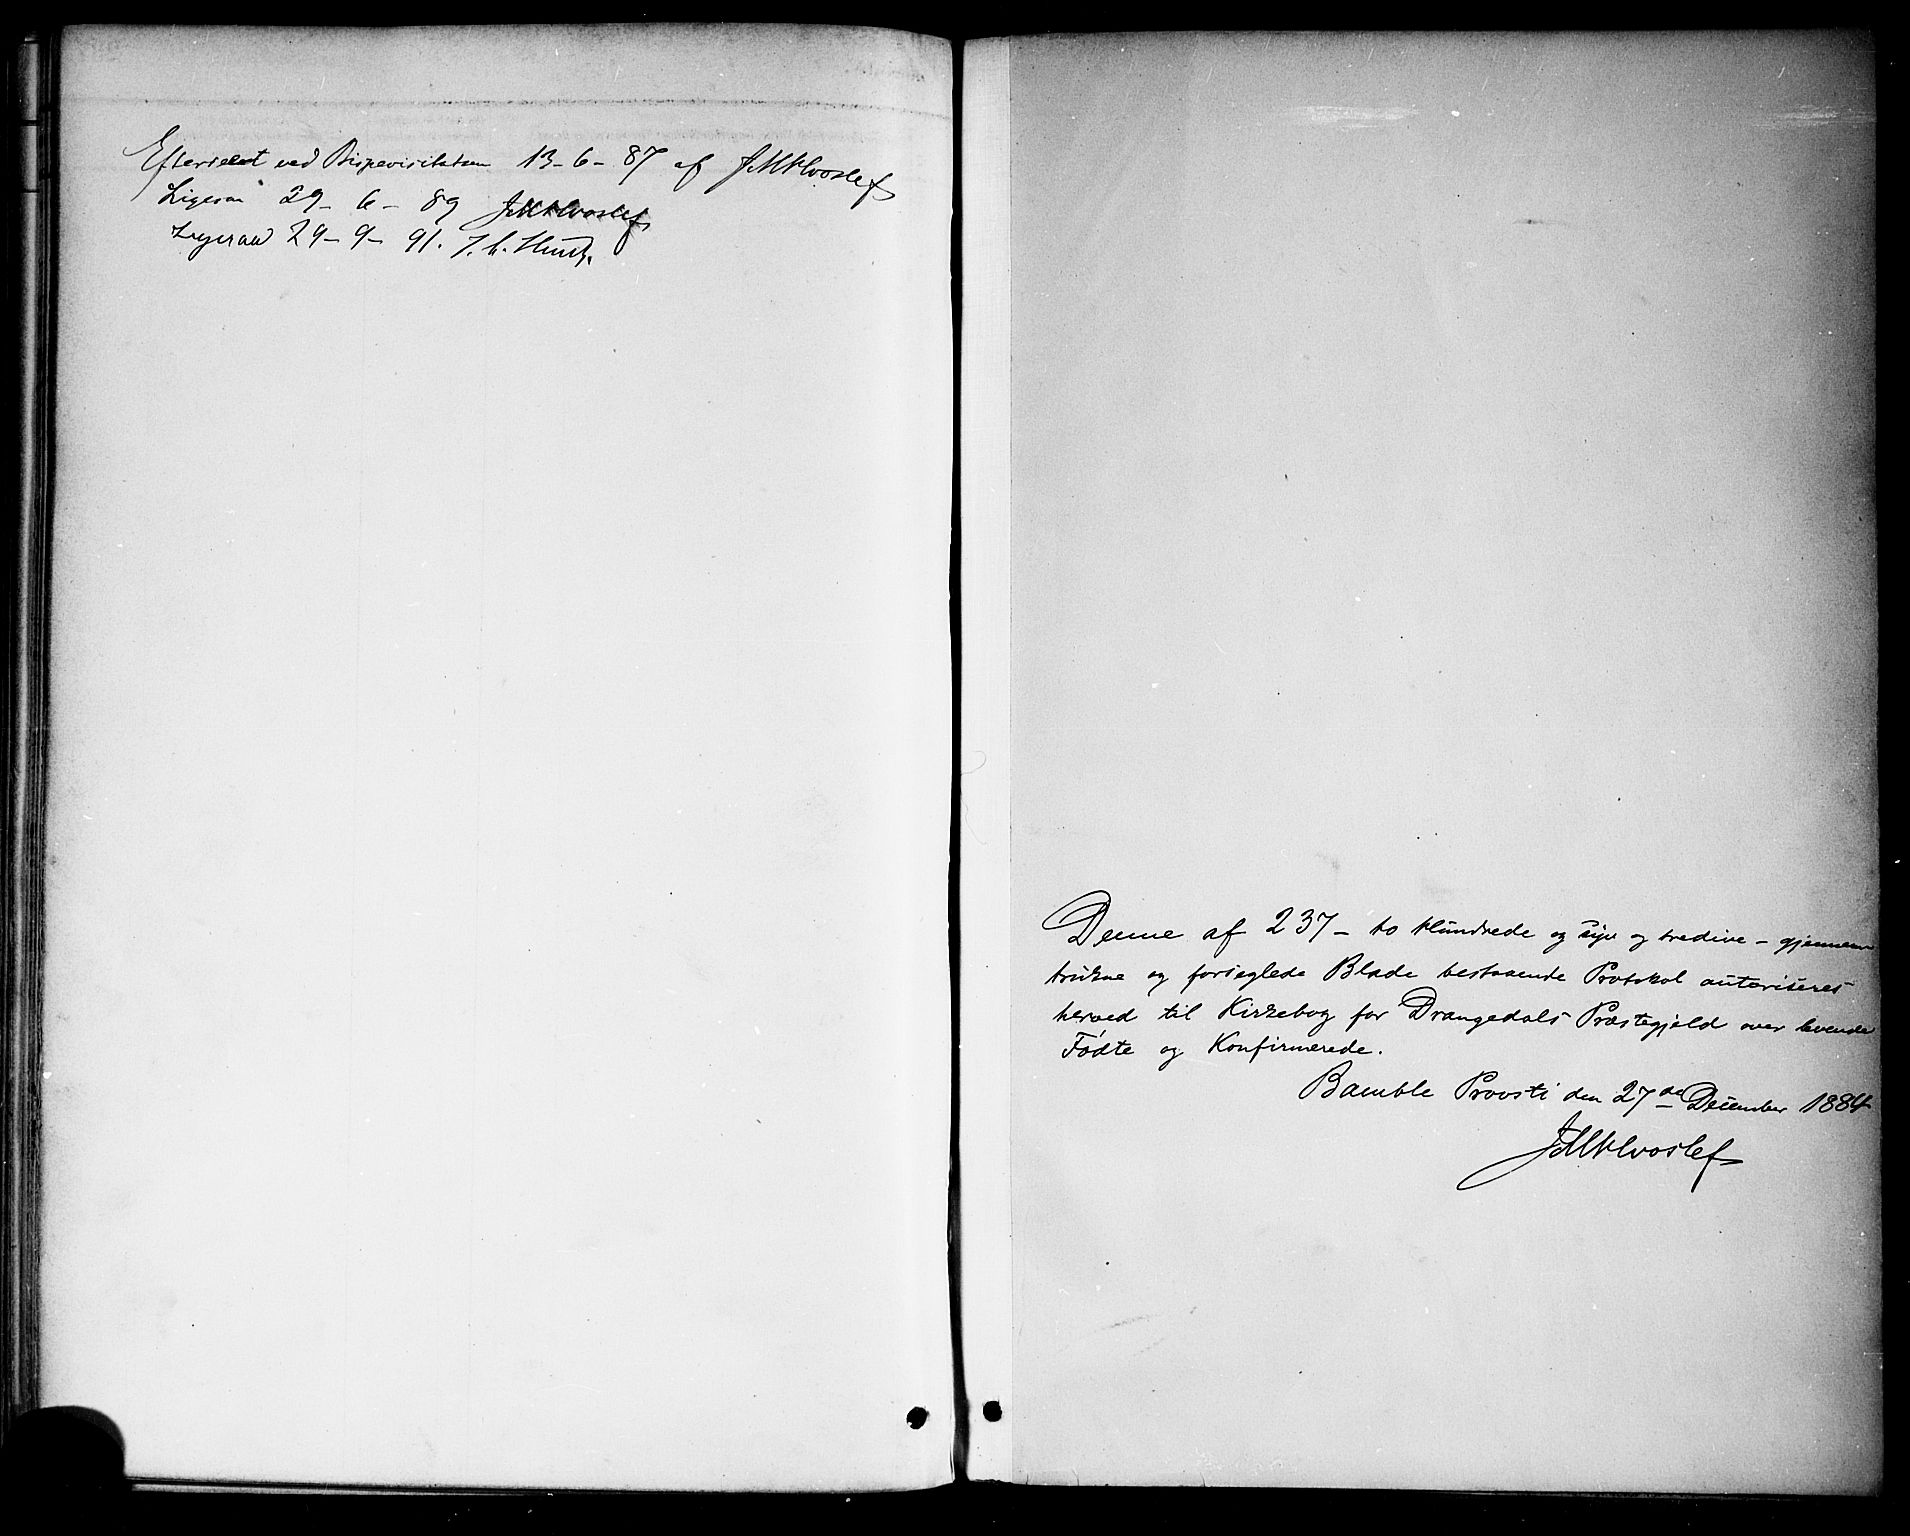 SAKO, Drangedal kirkebøker, F/Fa/L0010: Ministerialbok nr. 10 /1, 1885-1894